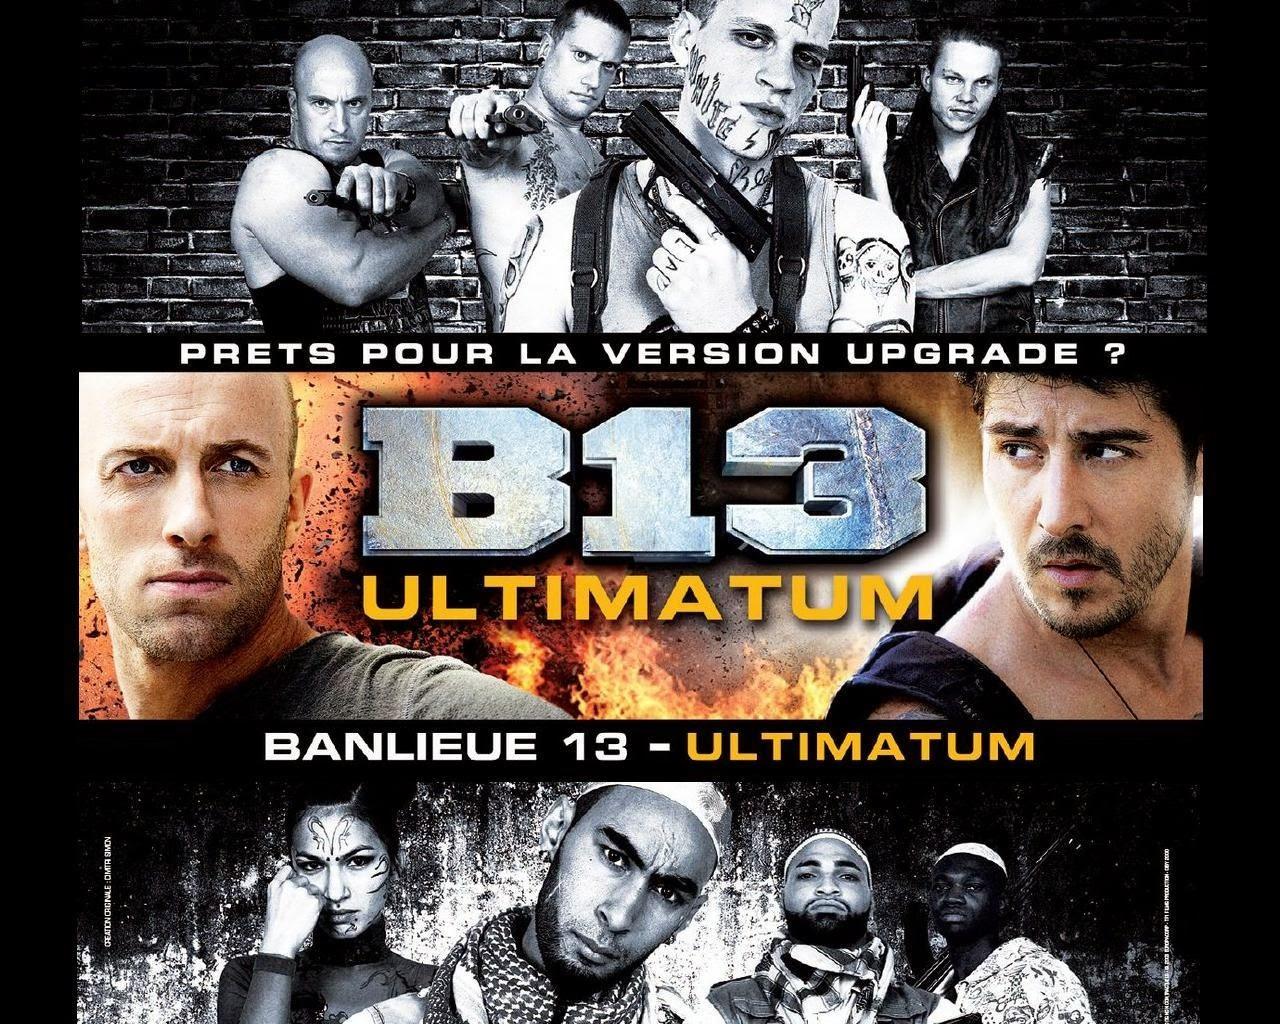 film b13 motarjam